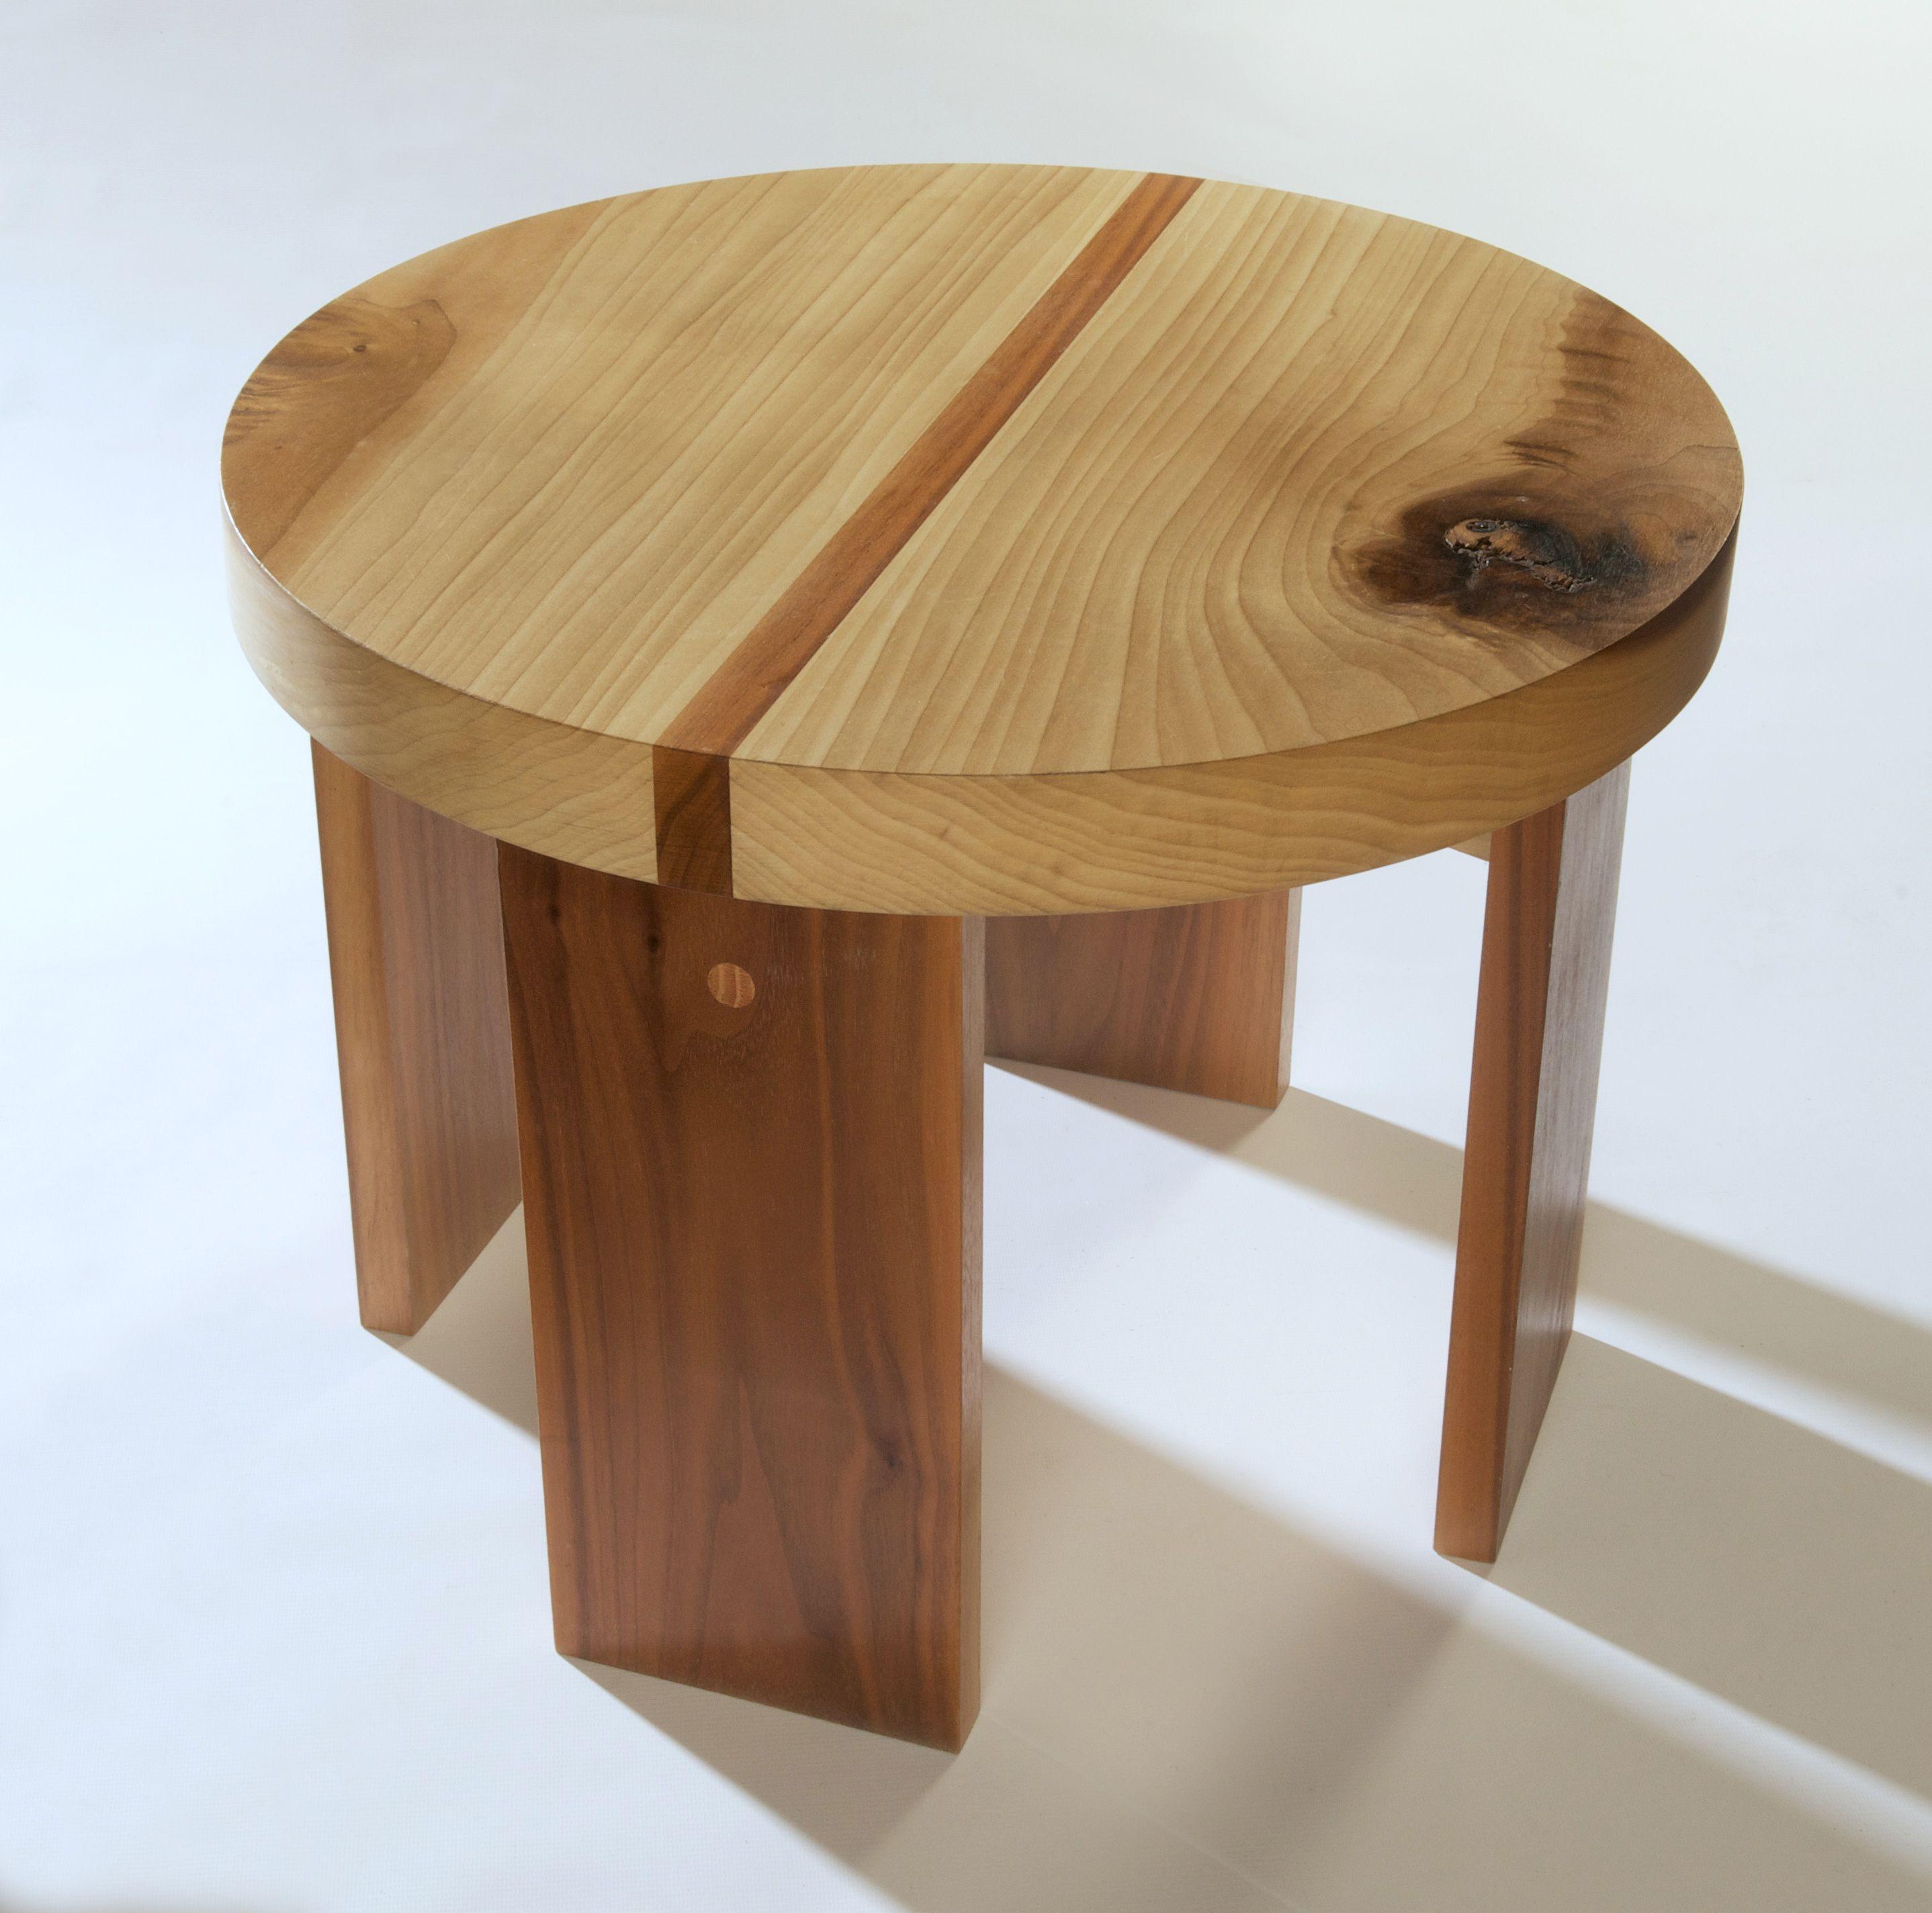 Lola Coffee Table With Storage: Circular Coffee Table In Tulip Wood